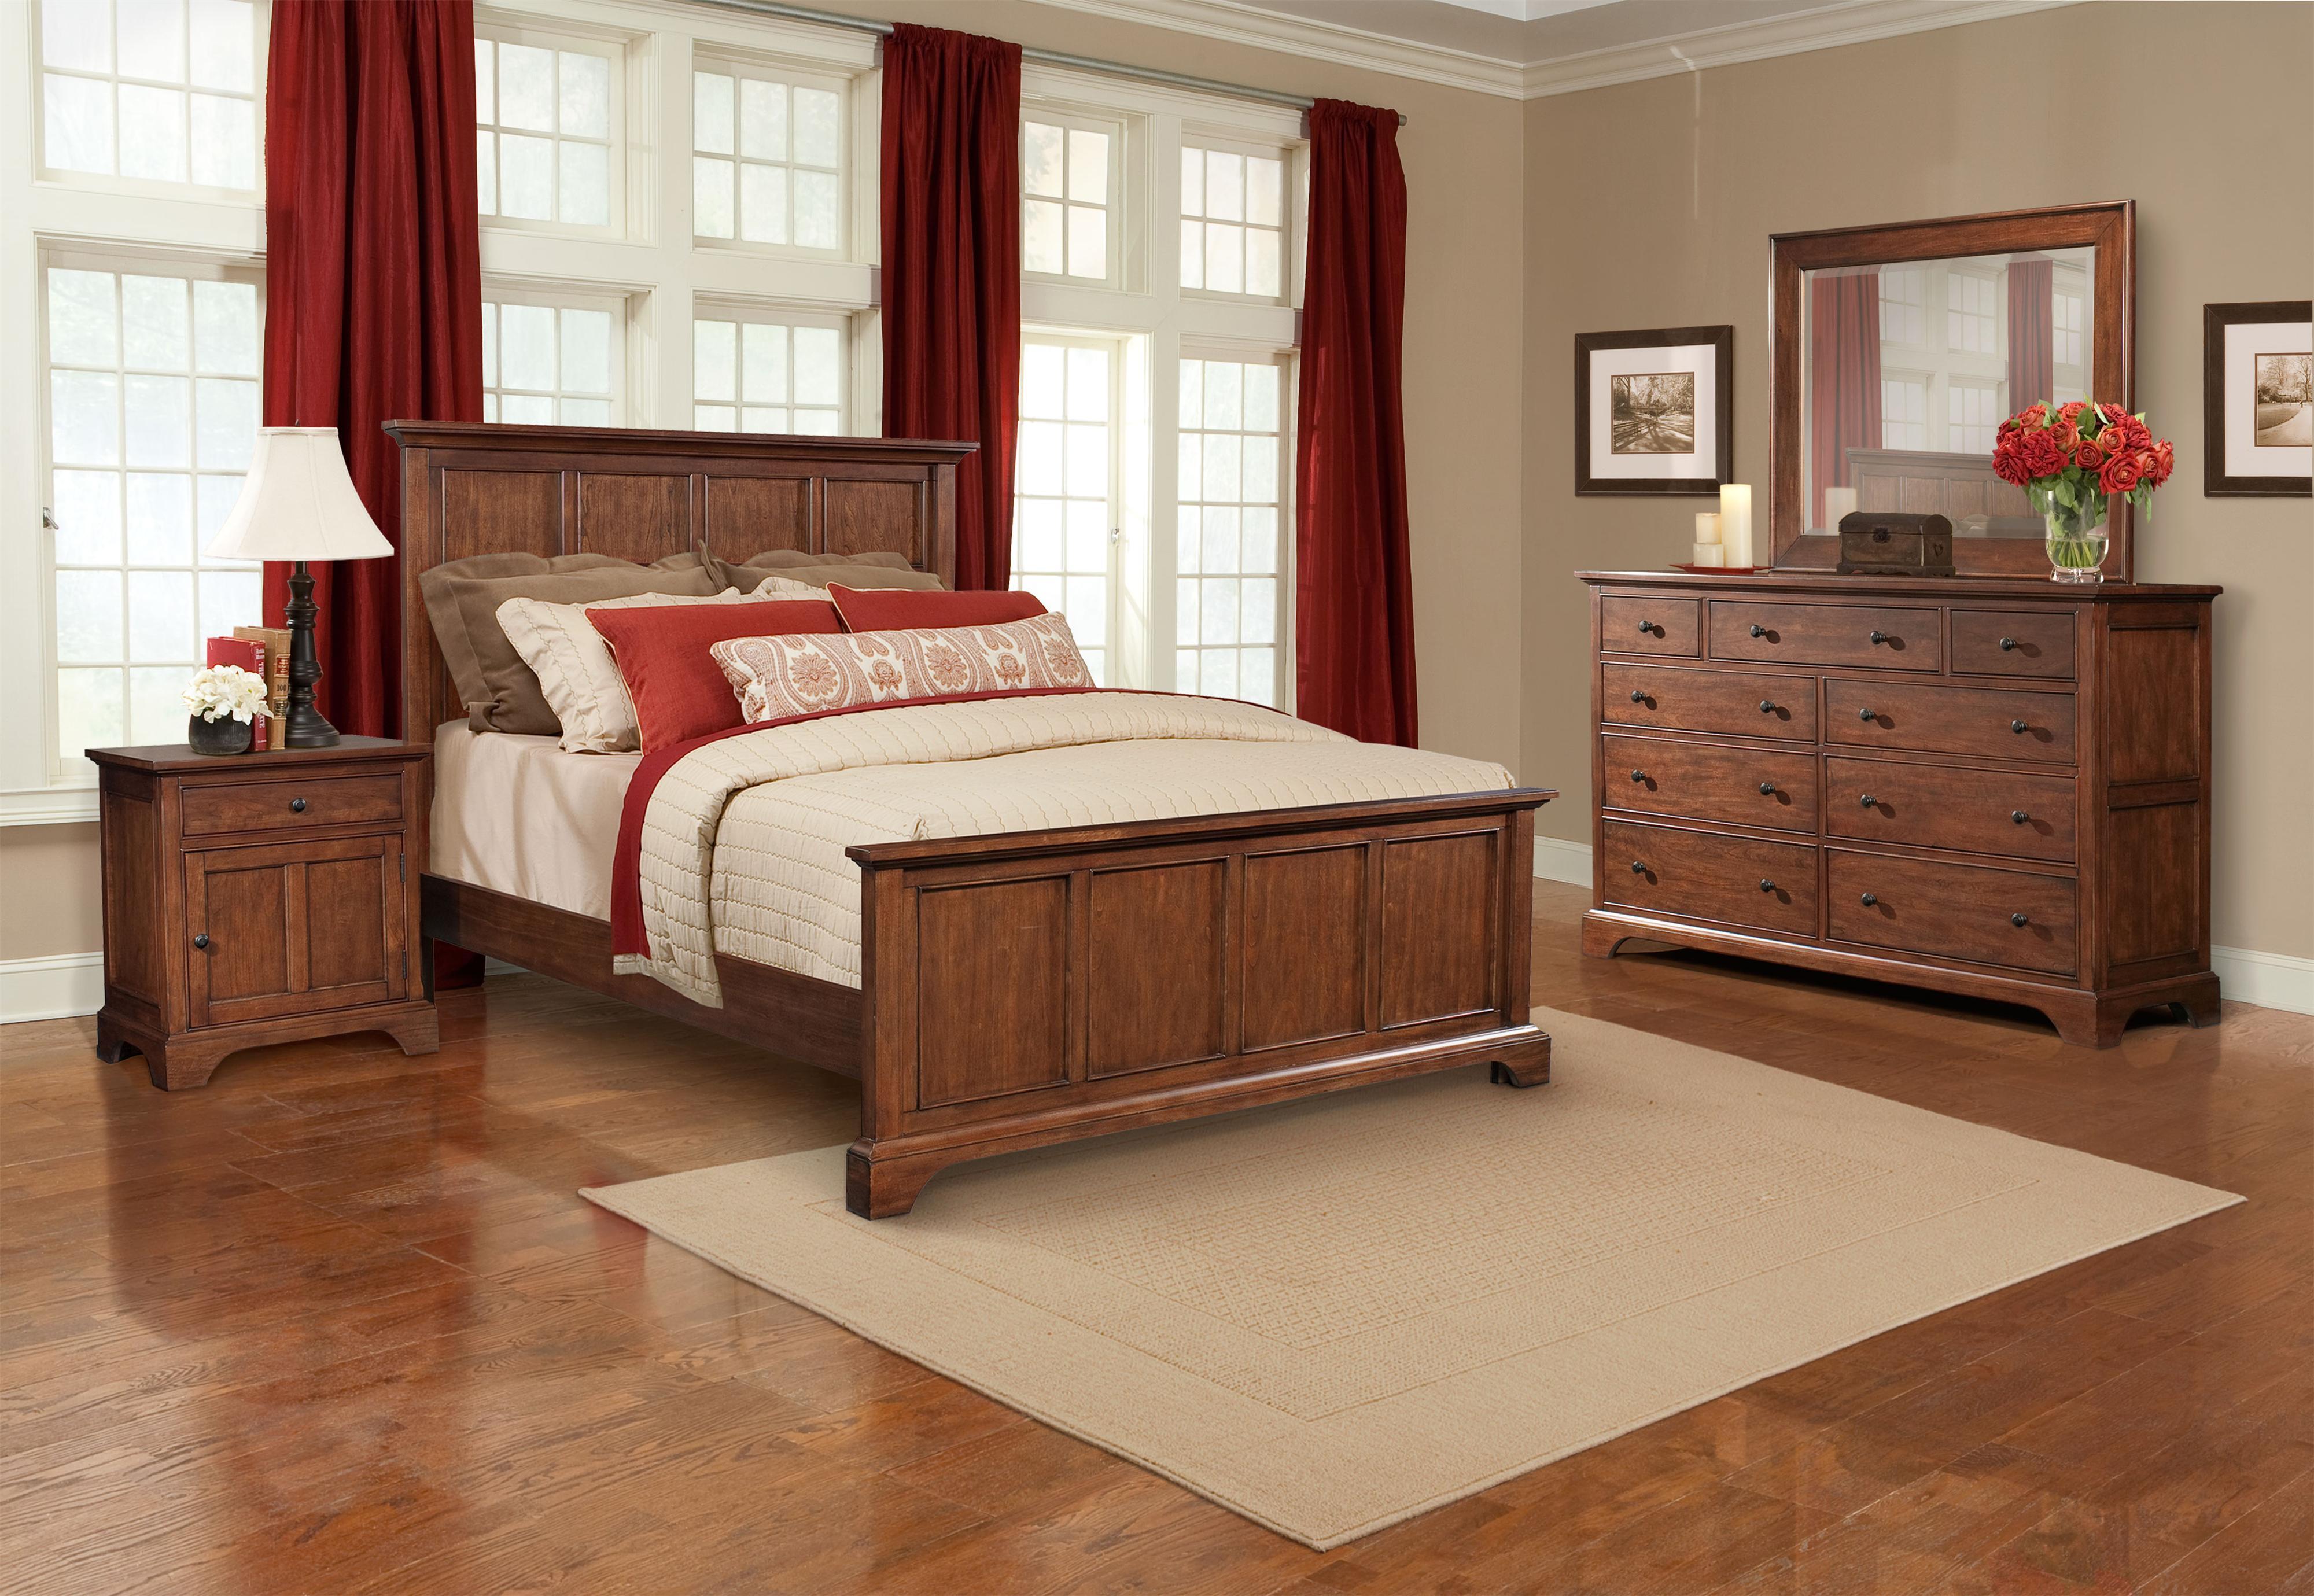 Cresent Fine Furniture Retreat Cherry King Sleigh Bed | Broyhill Of Denver  | Sleigh Bed Denver, Aurora, Parker, Highlands Ranch, Castle Rock, CO